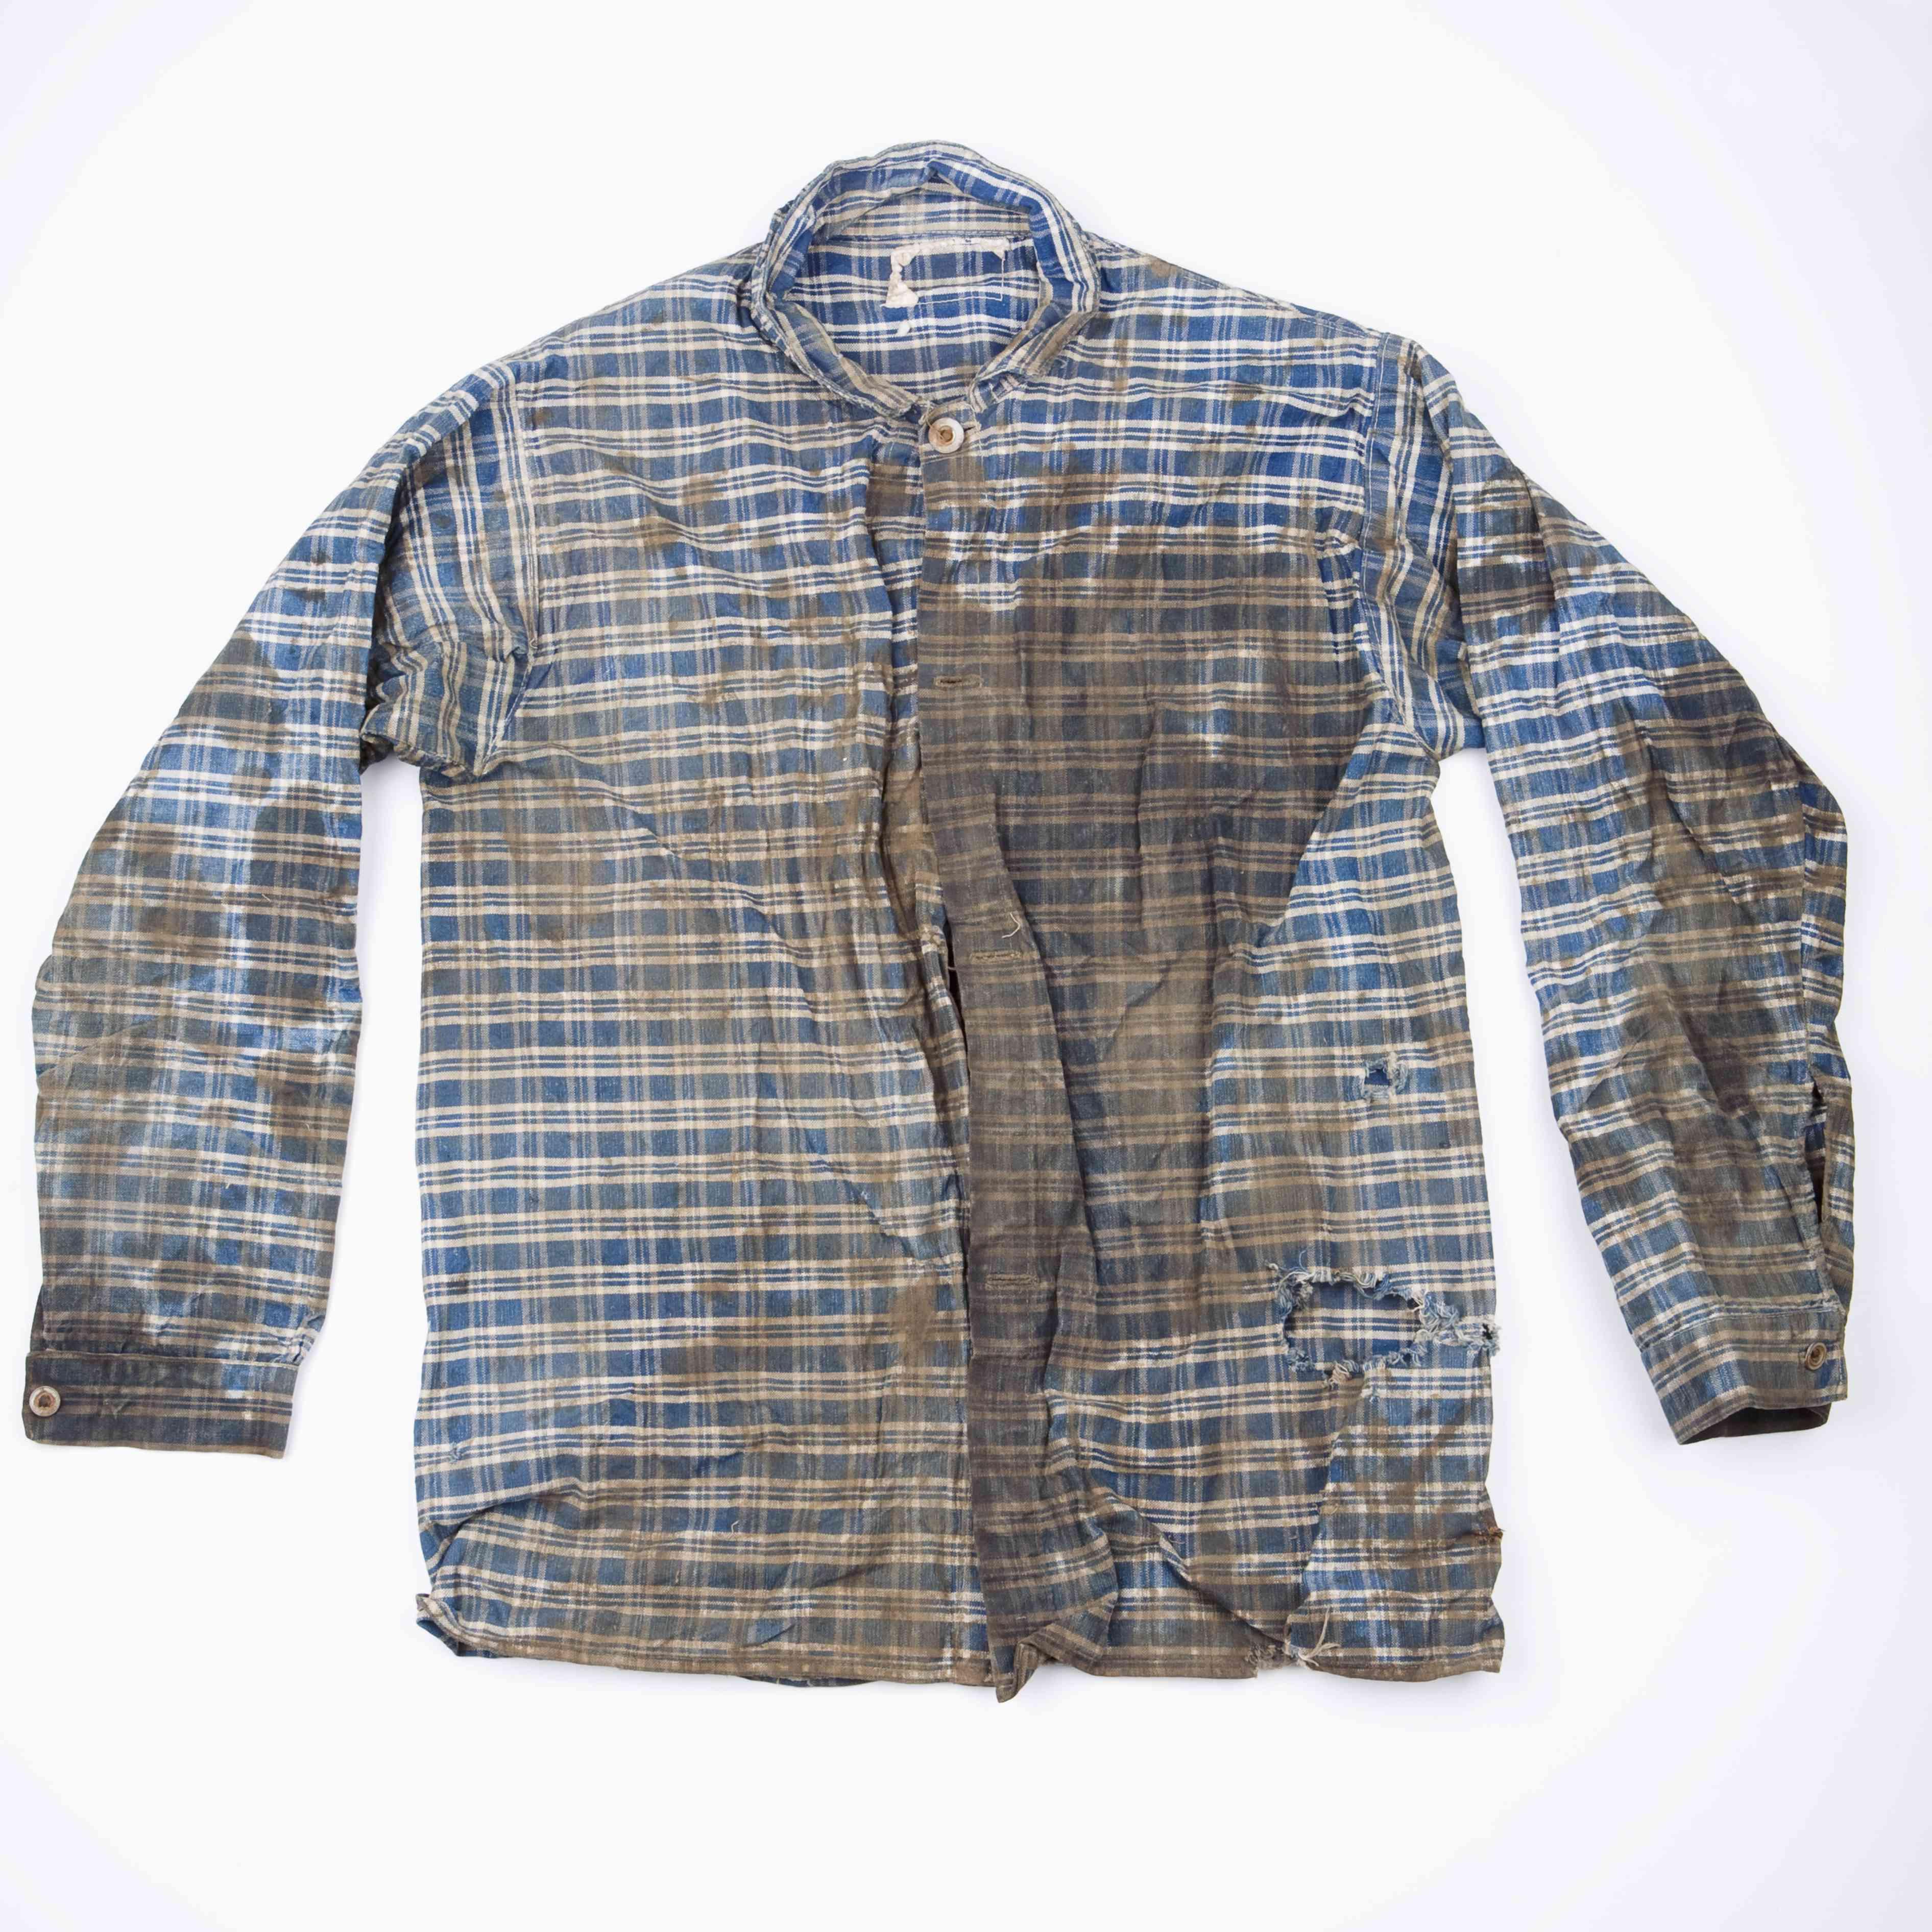 Dirty checked shirt